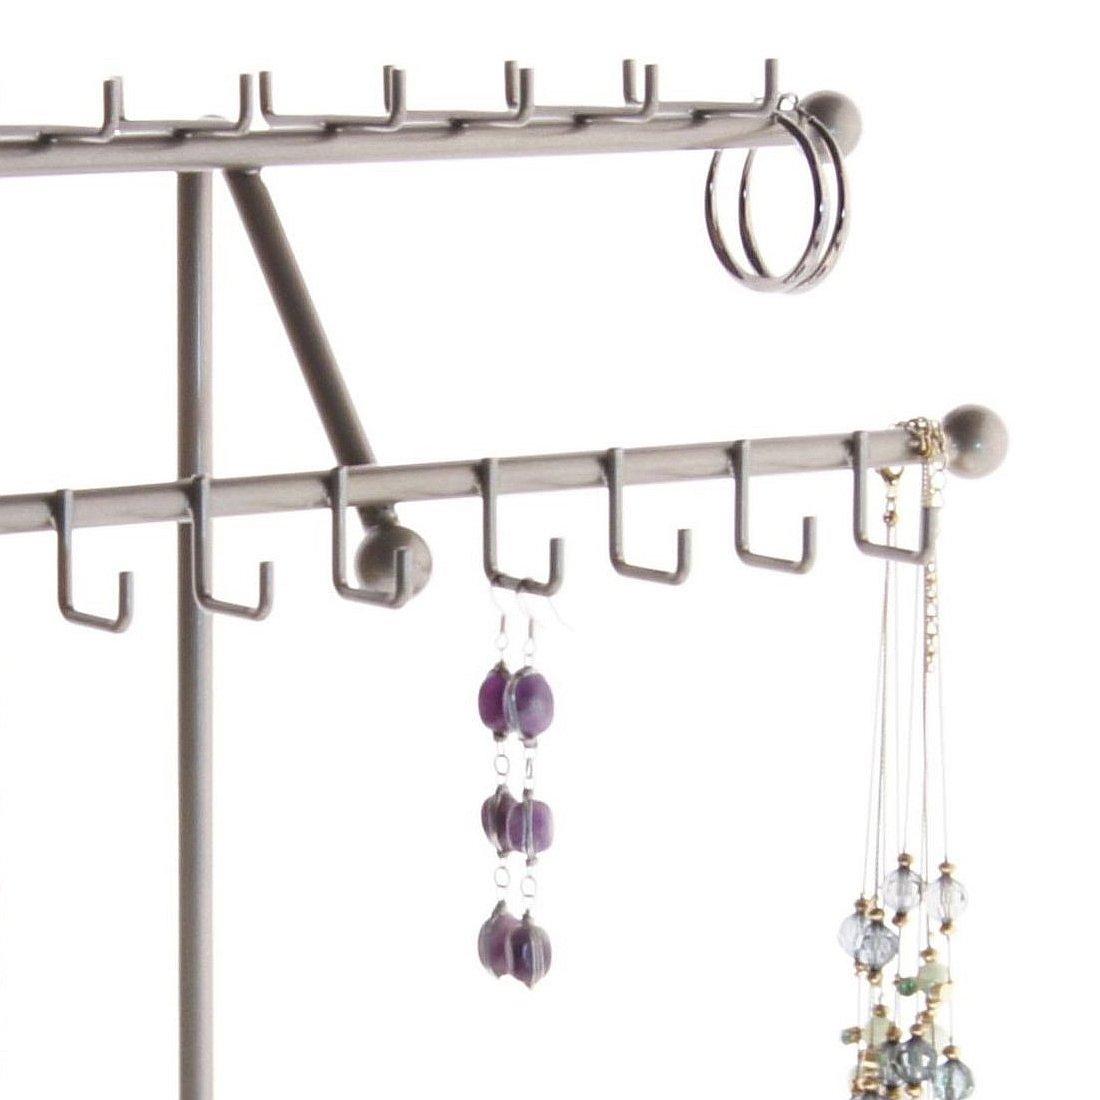 Angelynn's Necklace Holder Organizer Jewelry Tree Stand Storage Rack, Sharisa Satin Nickel Silver by Angelynn's (Image #4)